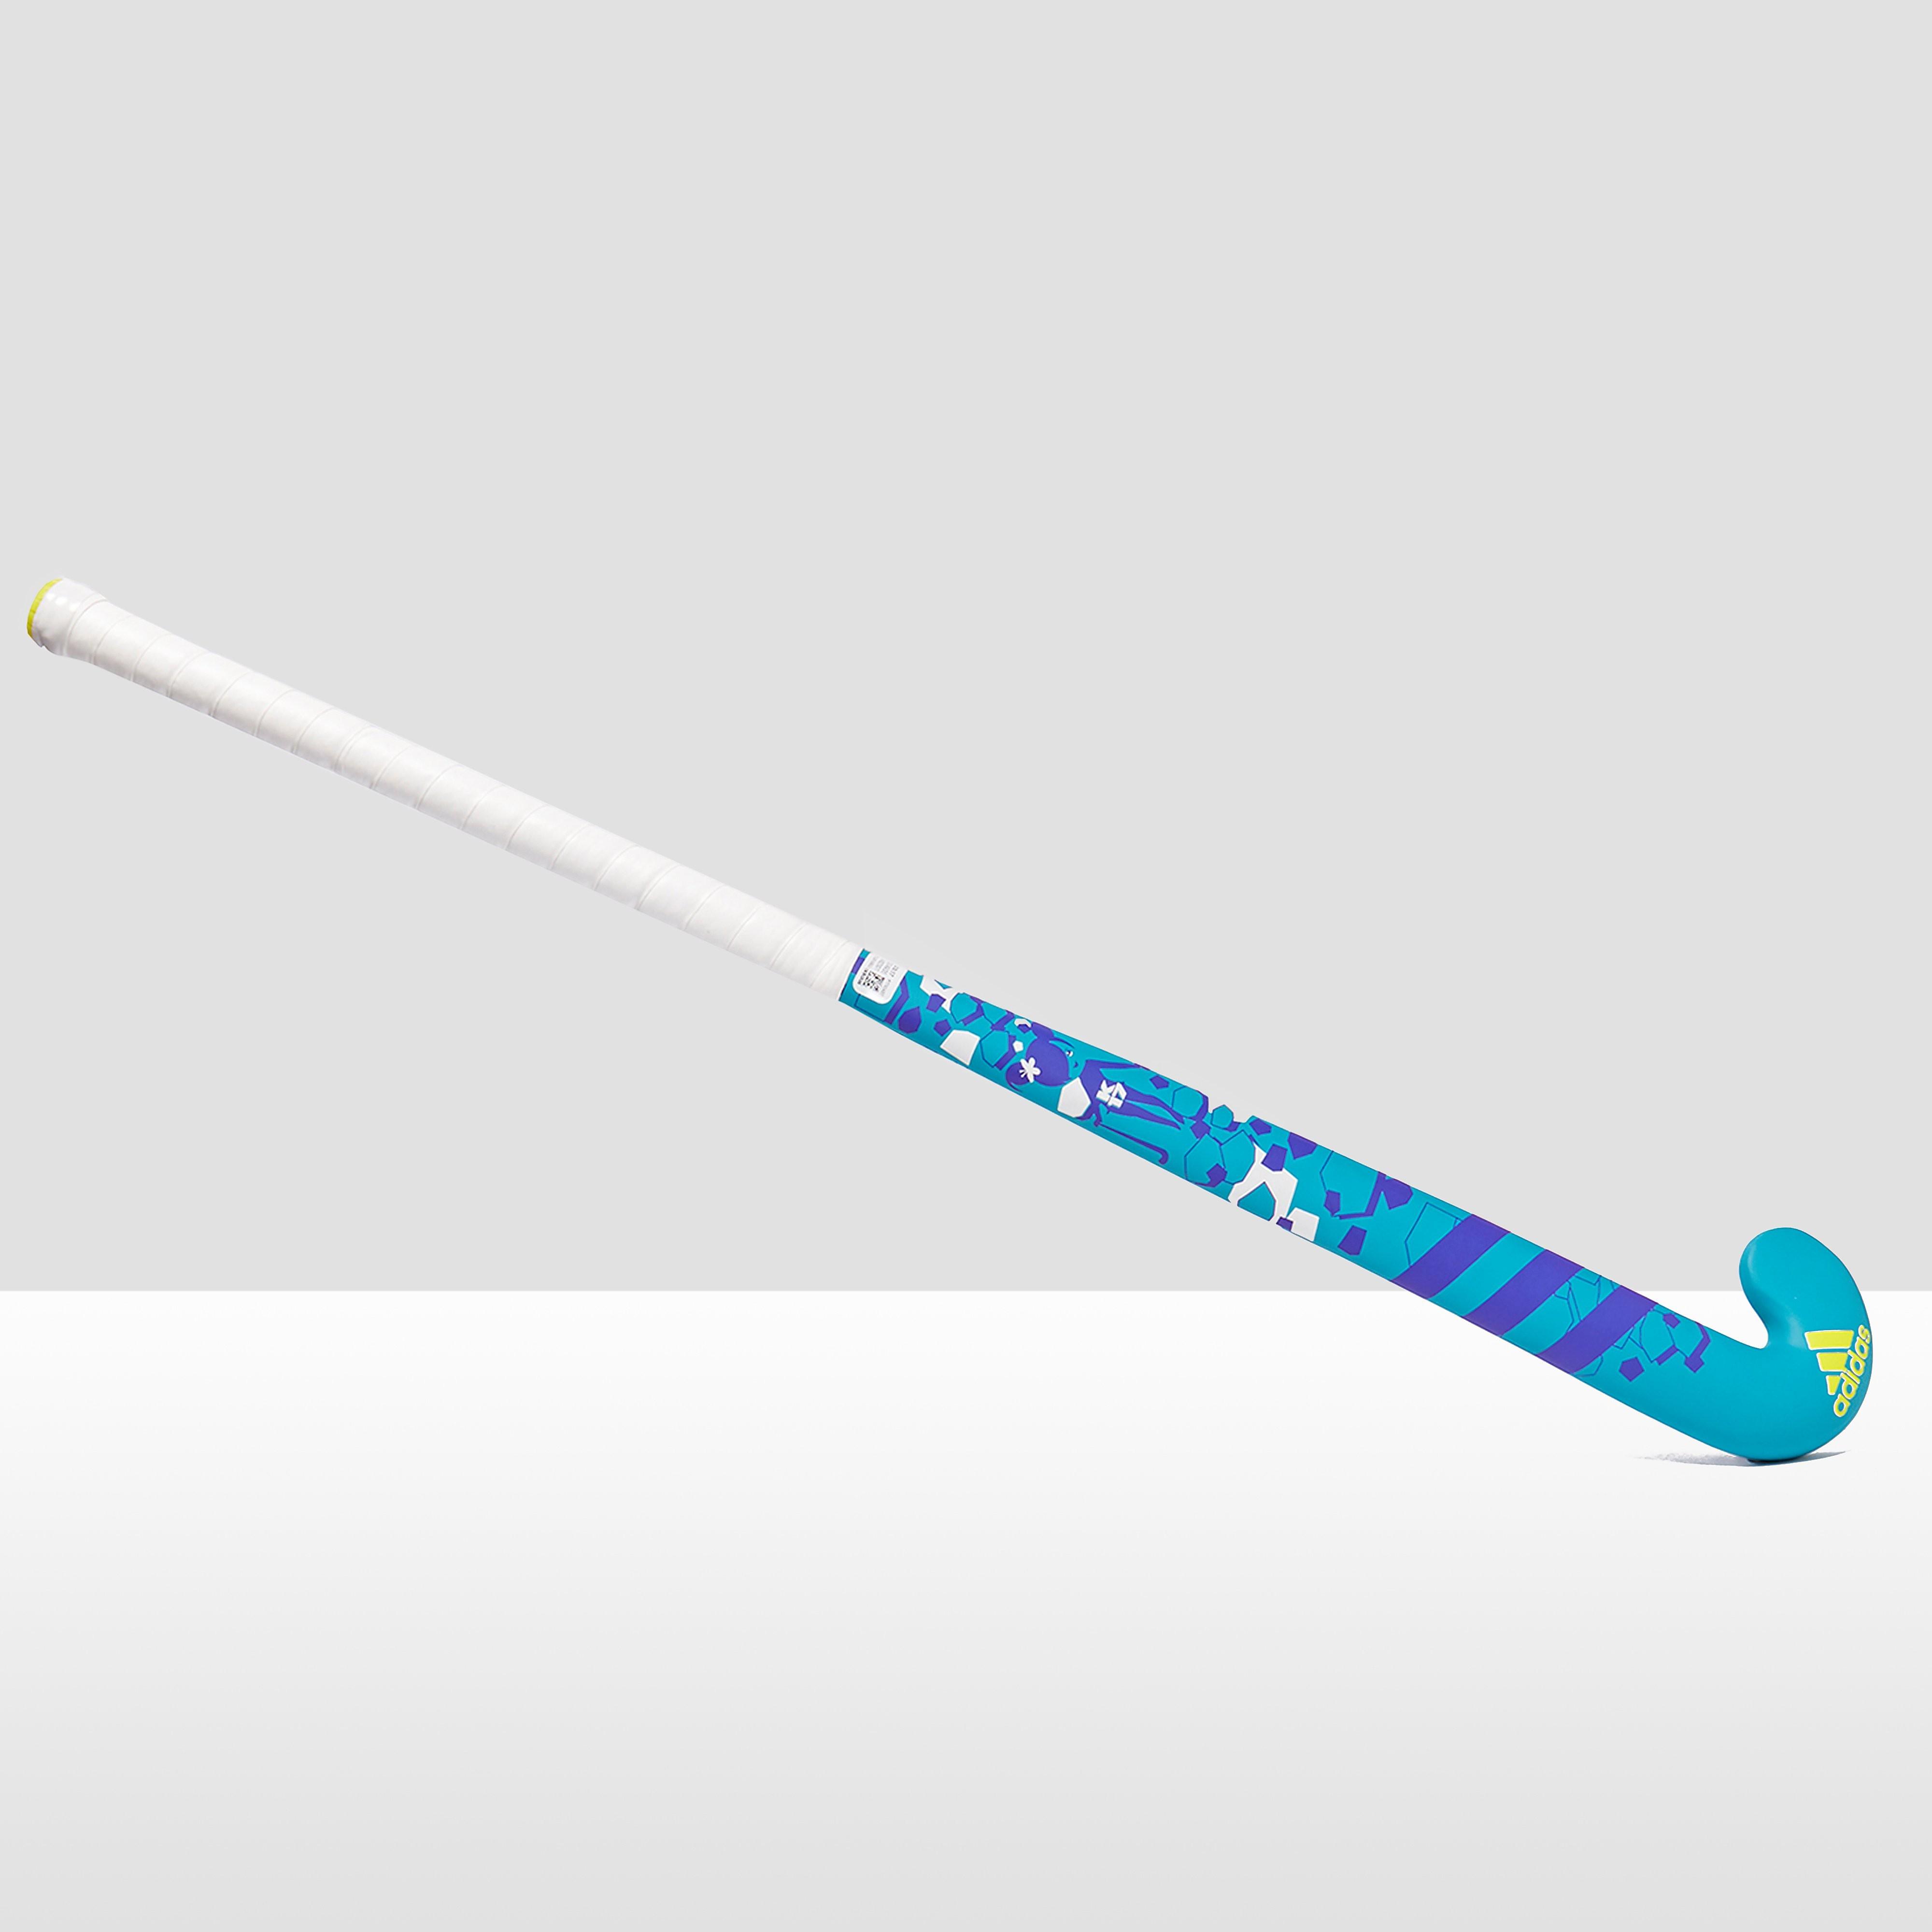 adidas K17 Queen JR Junior Wooden Hockey Stick 2017